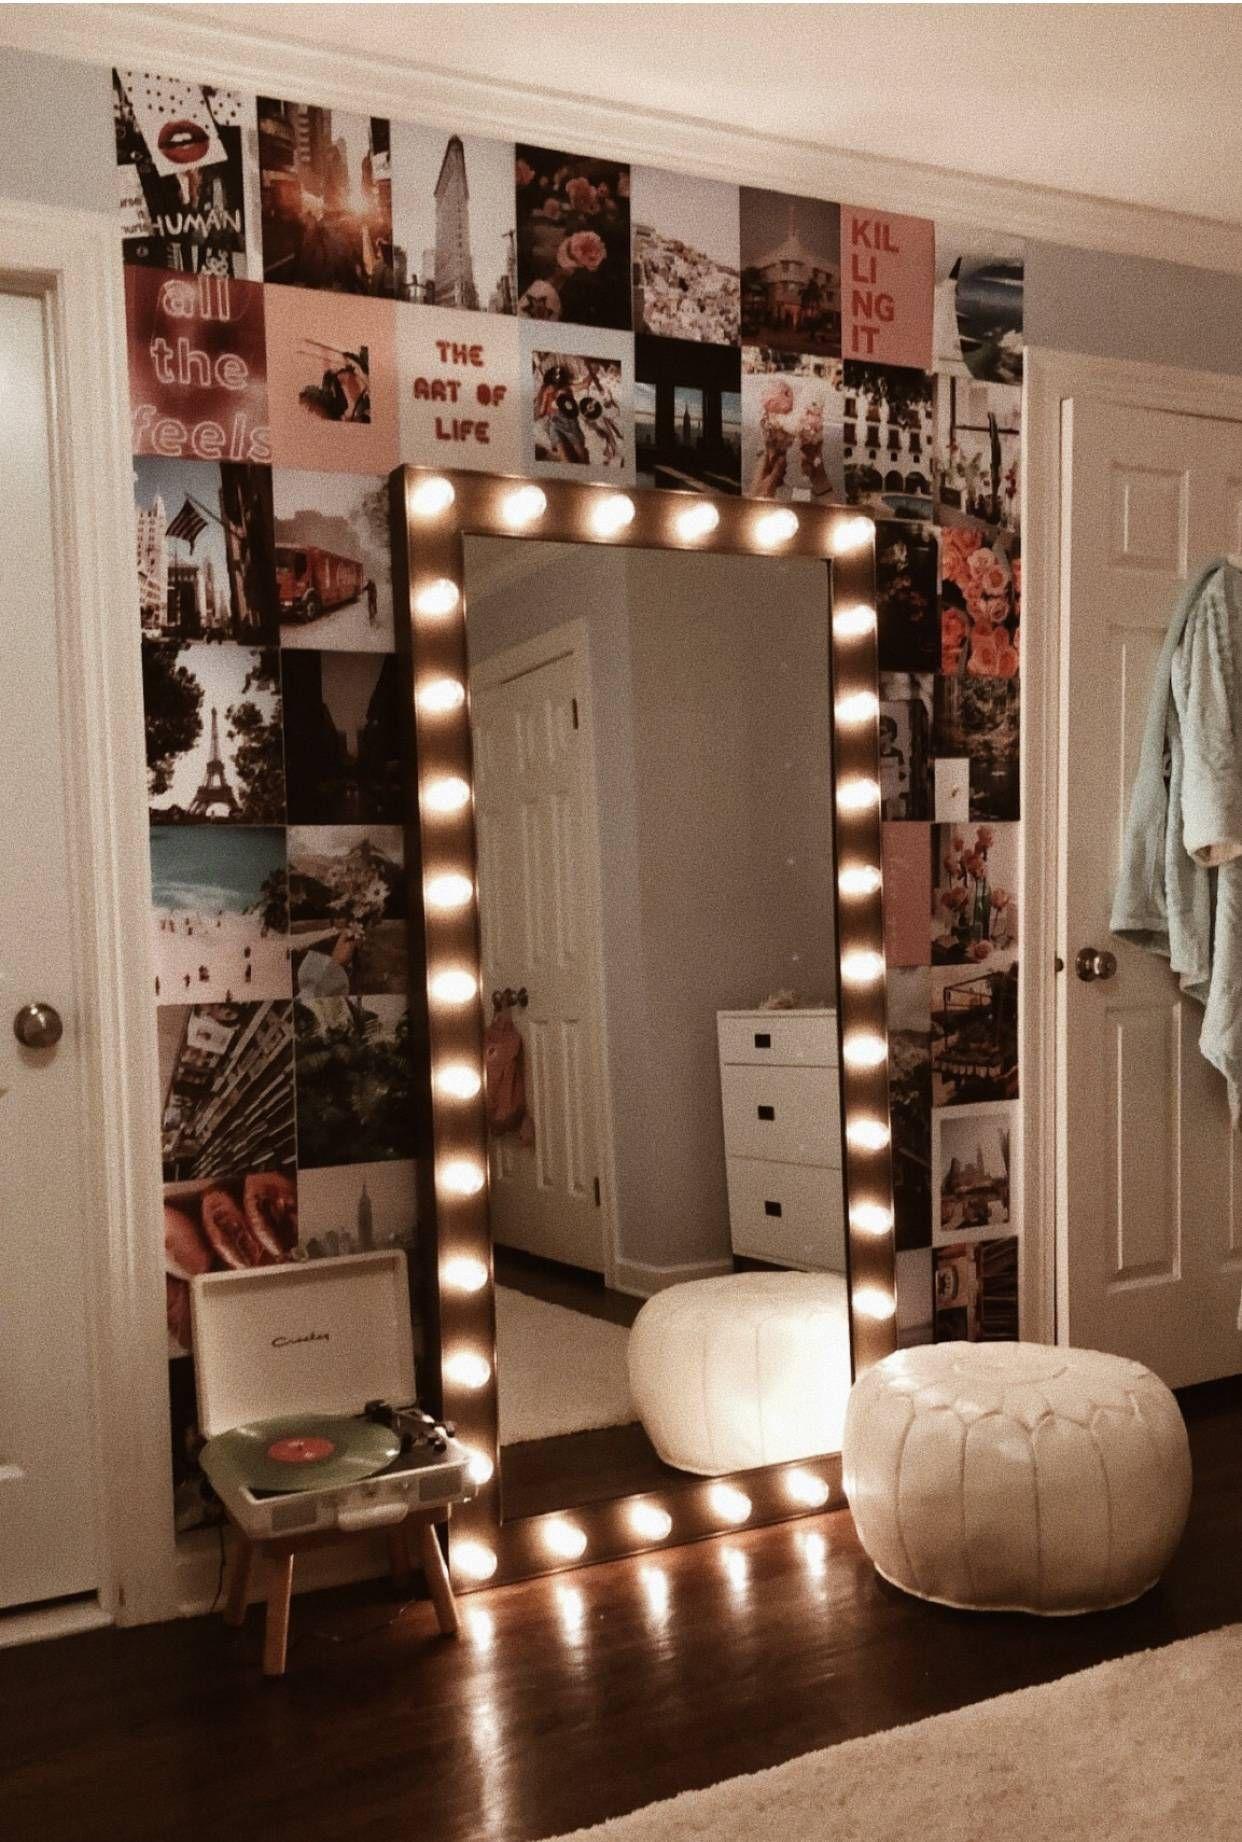 Vsco Decor Ideas – Must Have Decor for a Vsco Room – The Pink Dream